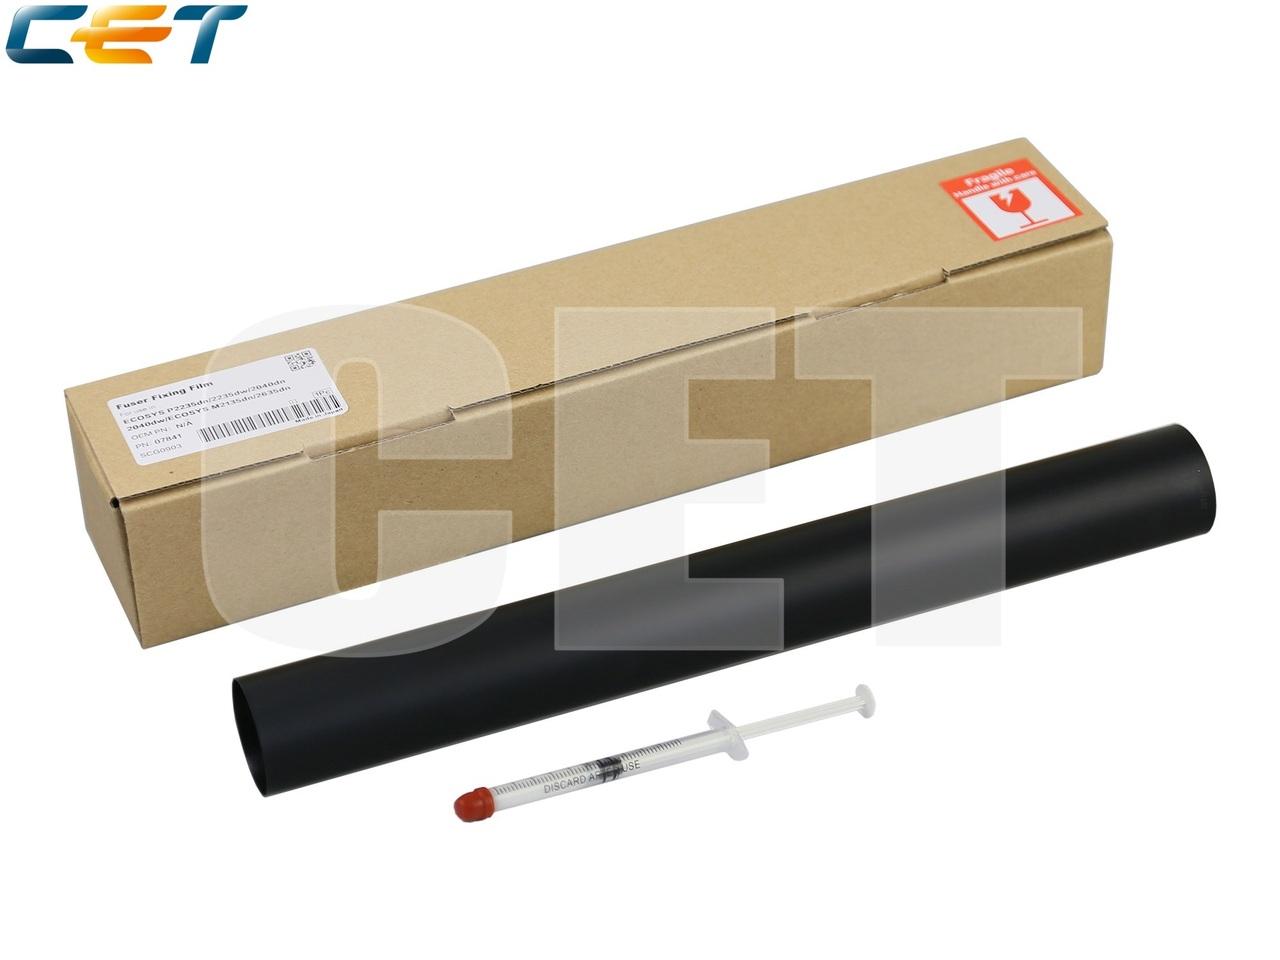 Термопленка для KYOCERA ECOSYSP2235dn/P2040dn/M2135dn/M2540dw (CET), CET7841